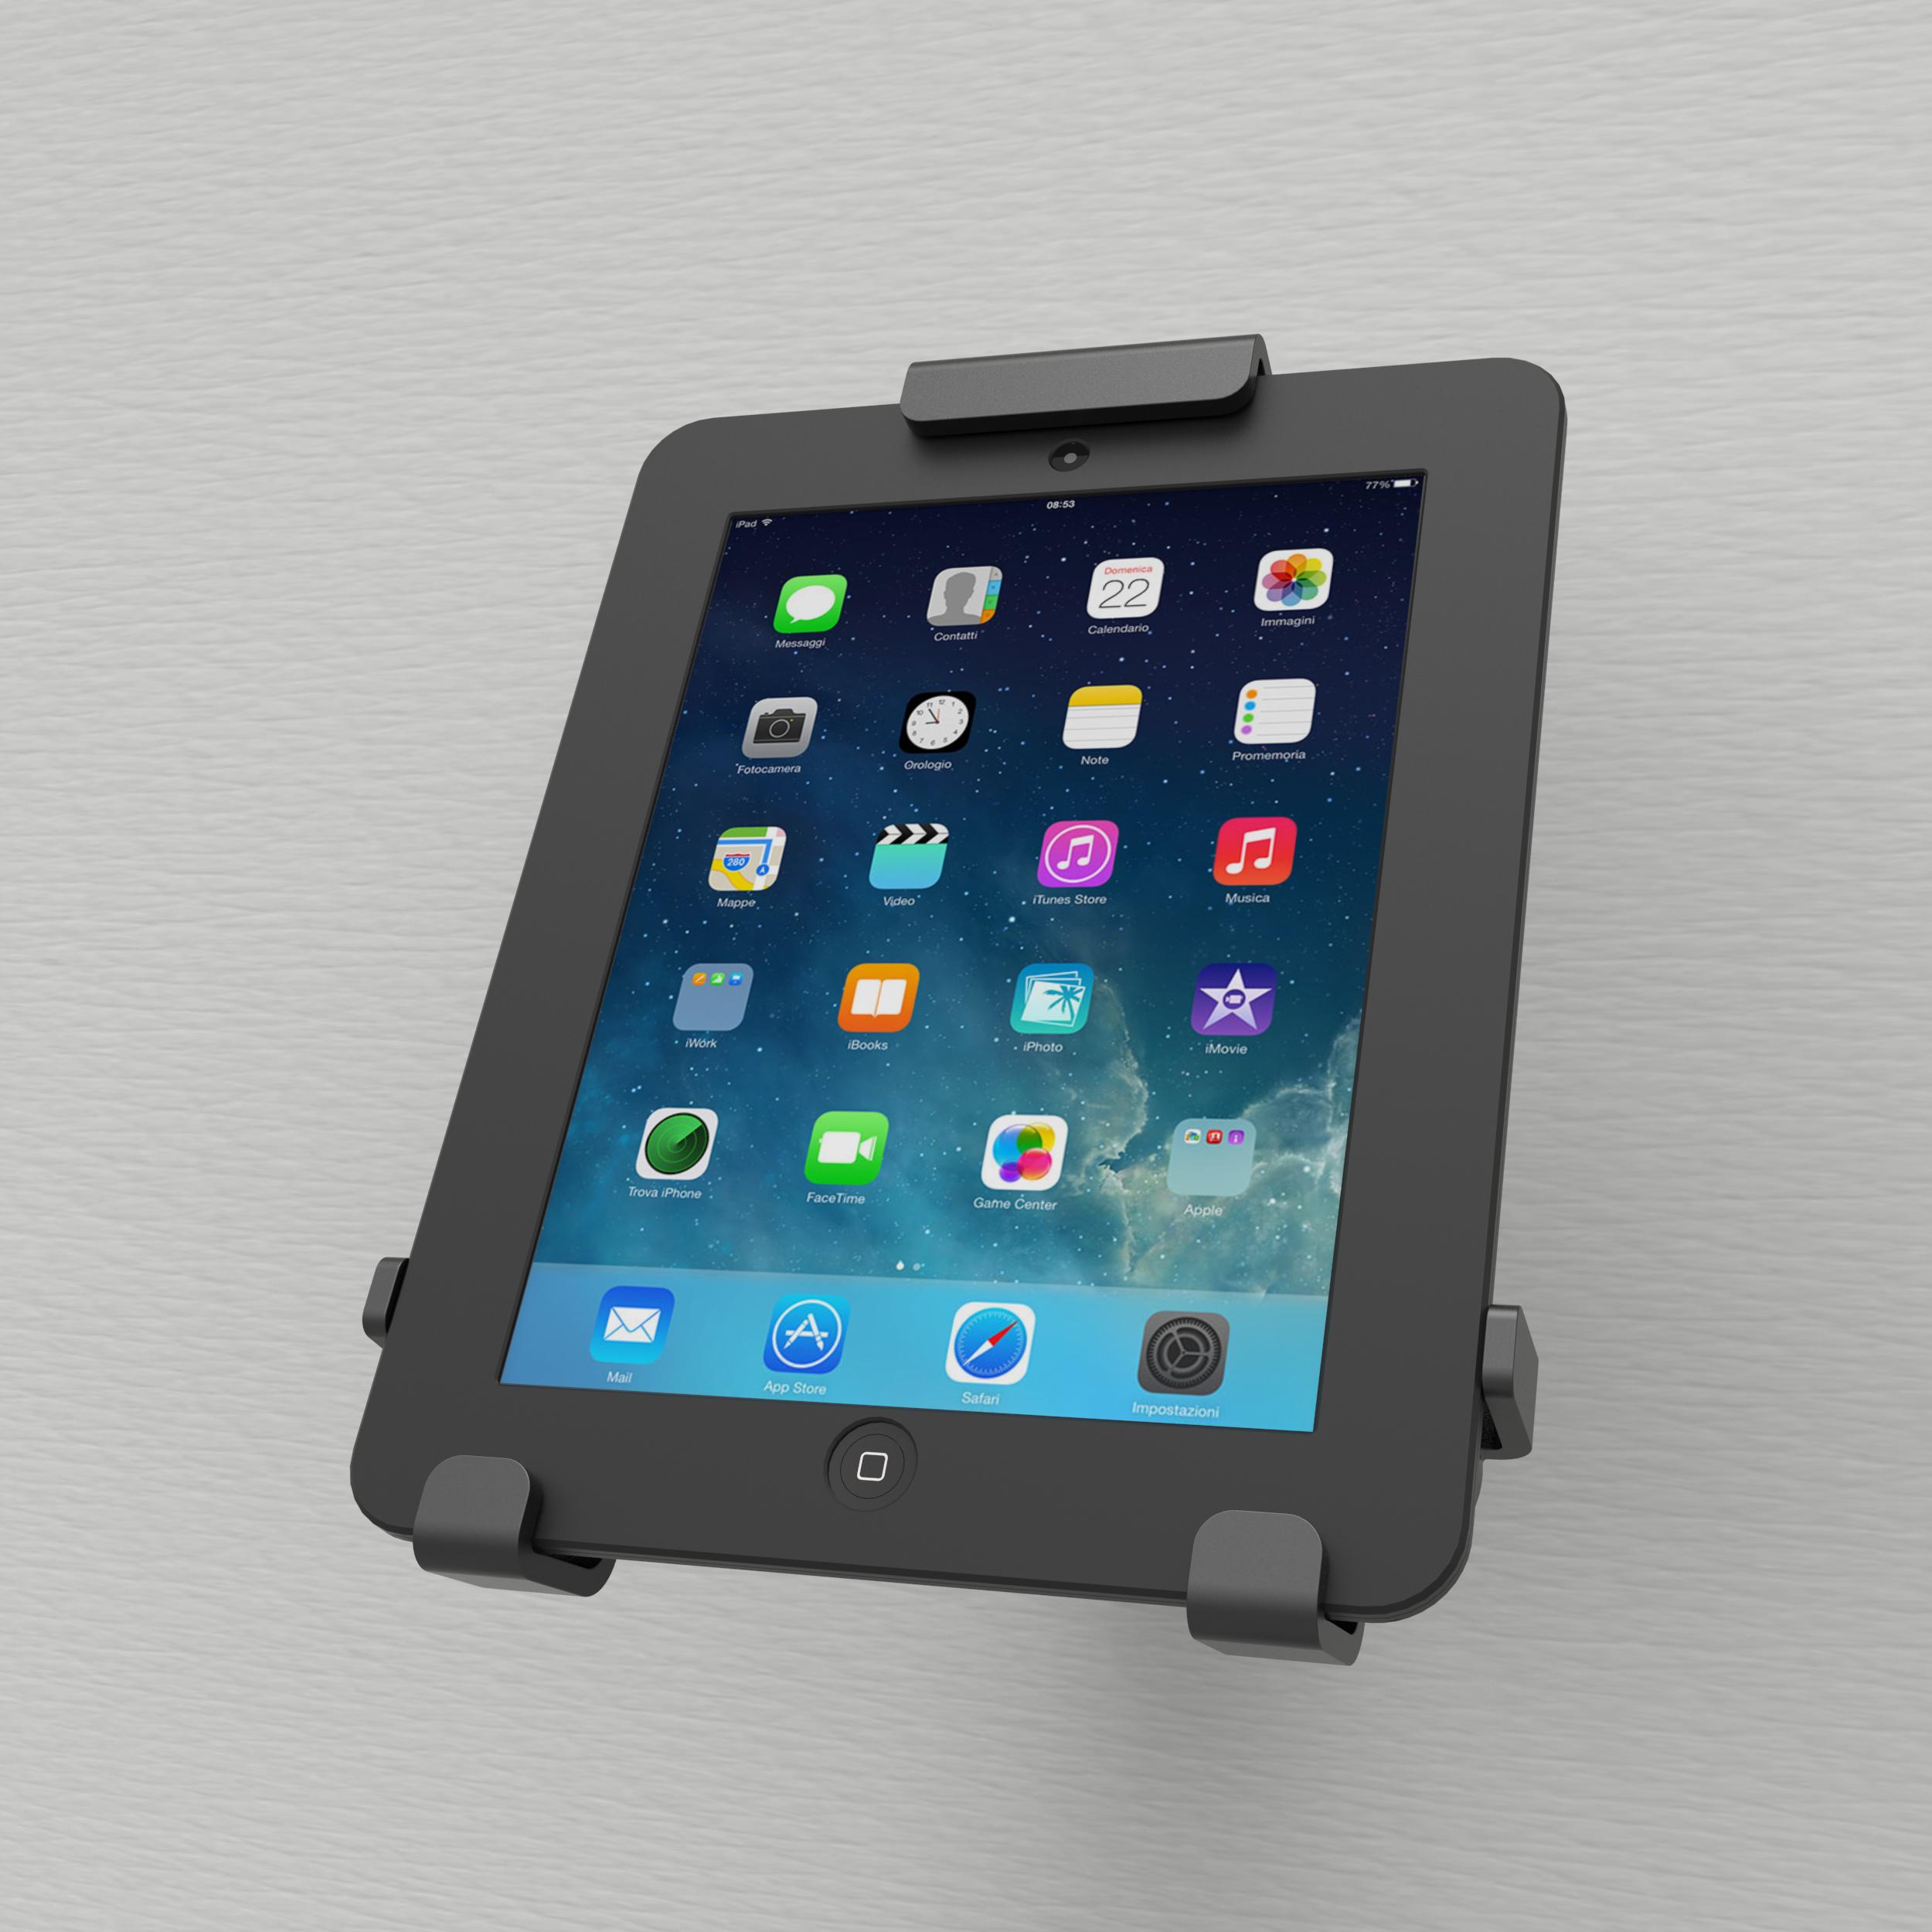 Koukku iPad iPhone 3G